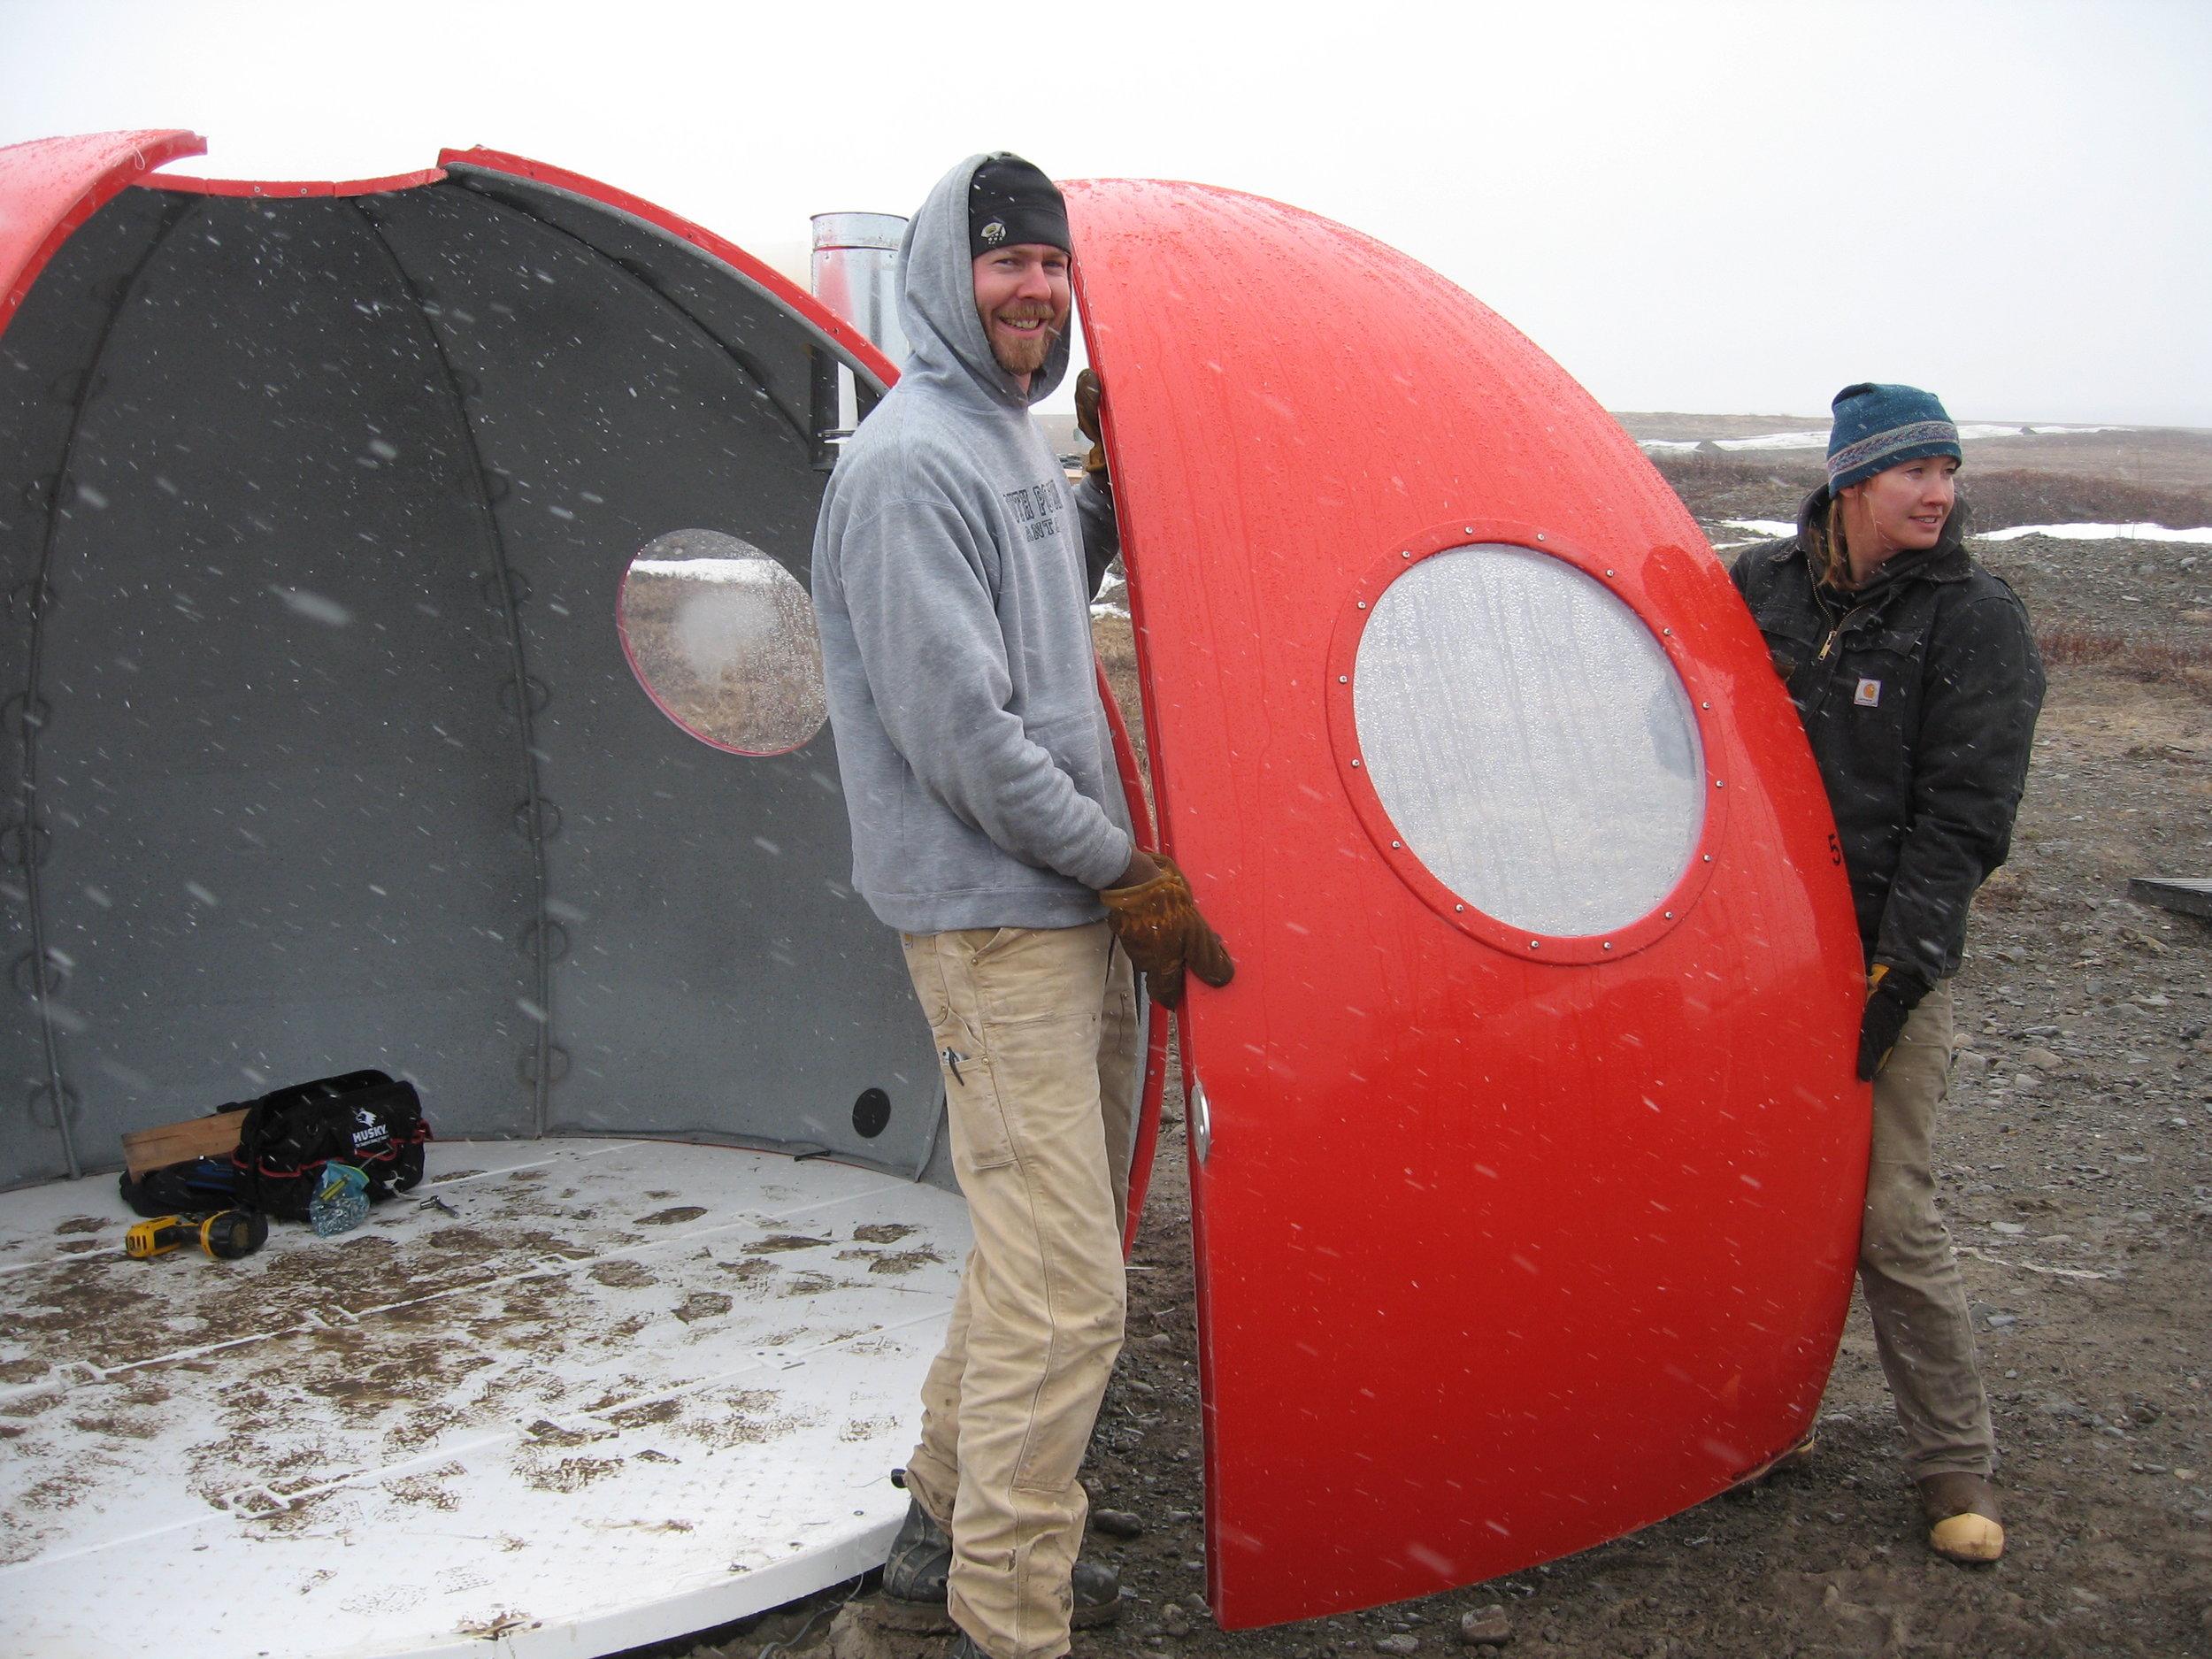 Back at Toolik Field Station, Erik Lund and Annalisa Neely take the Igloo apart.